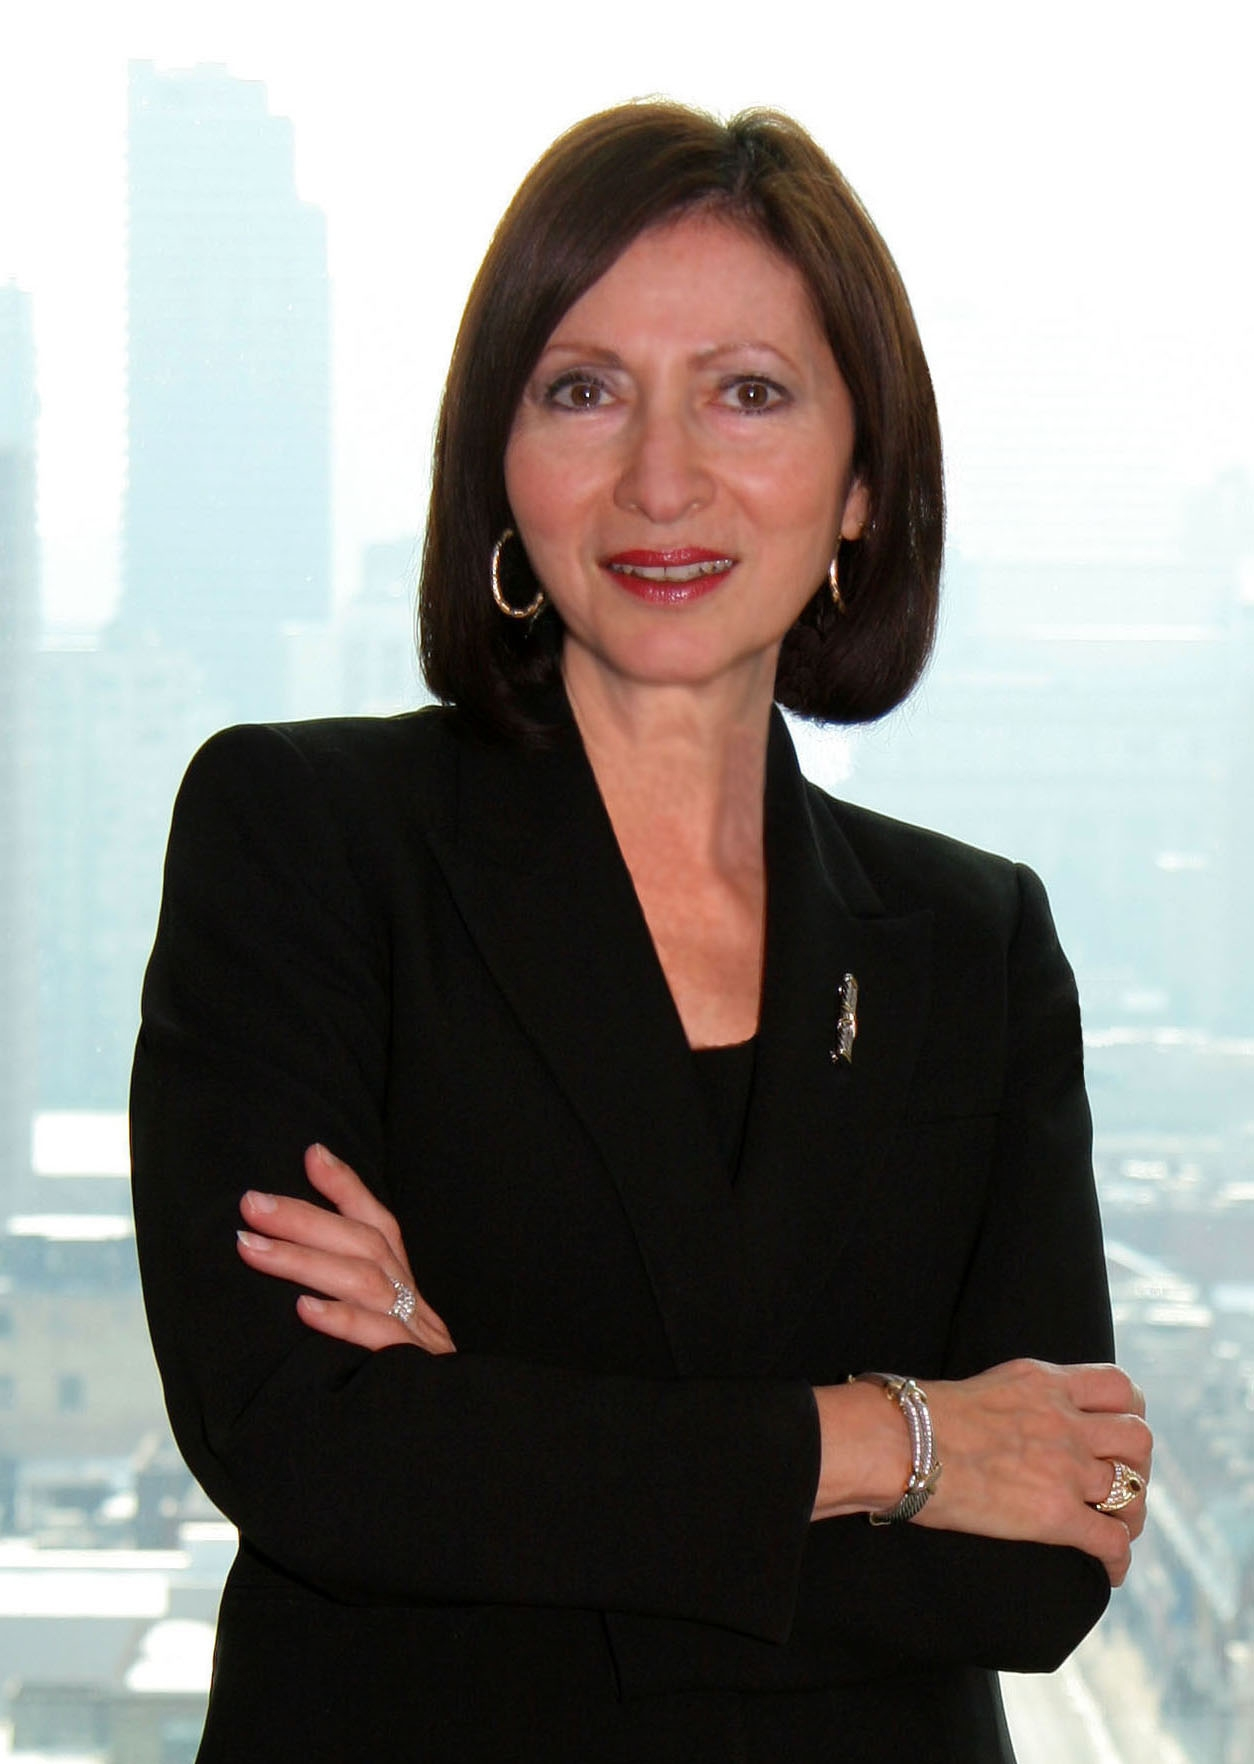 Dr. Ann Cavoukian